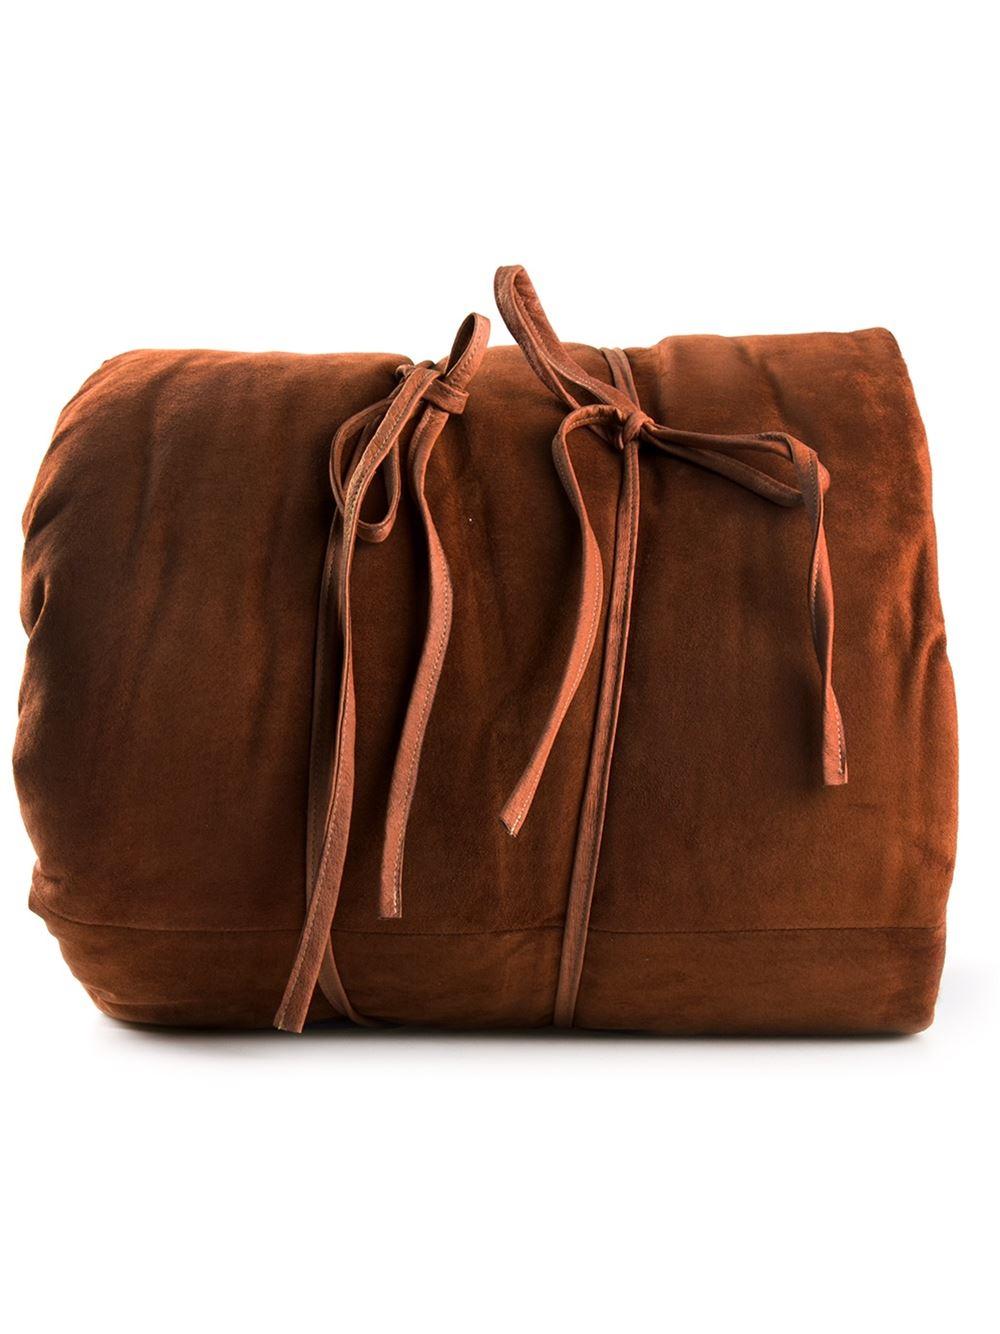 The Elder Statesman Cashmere Sleeping Bag $6,935.00